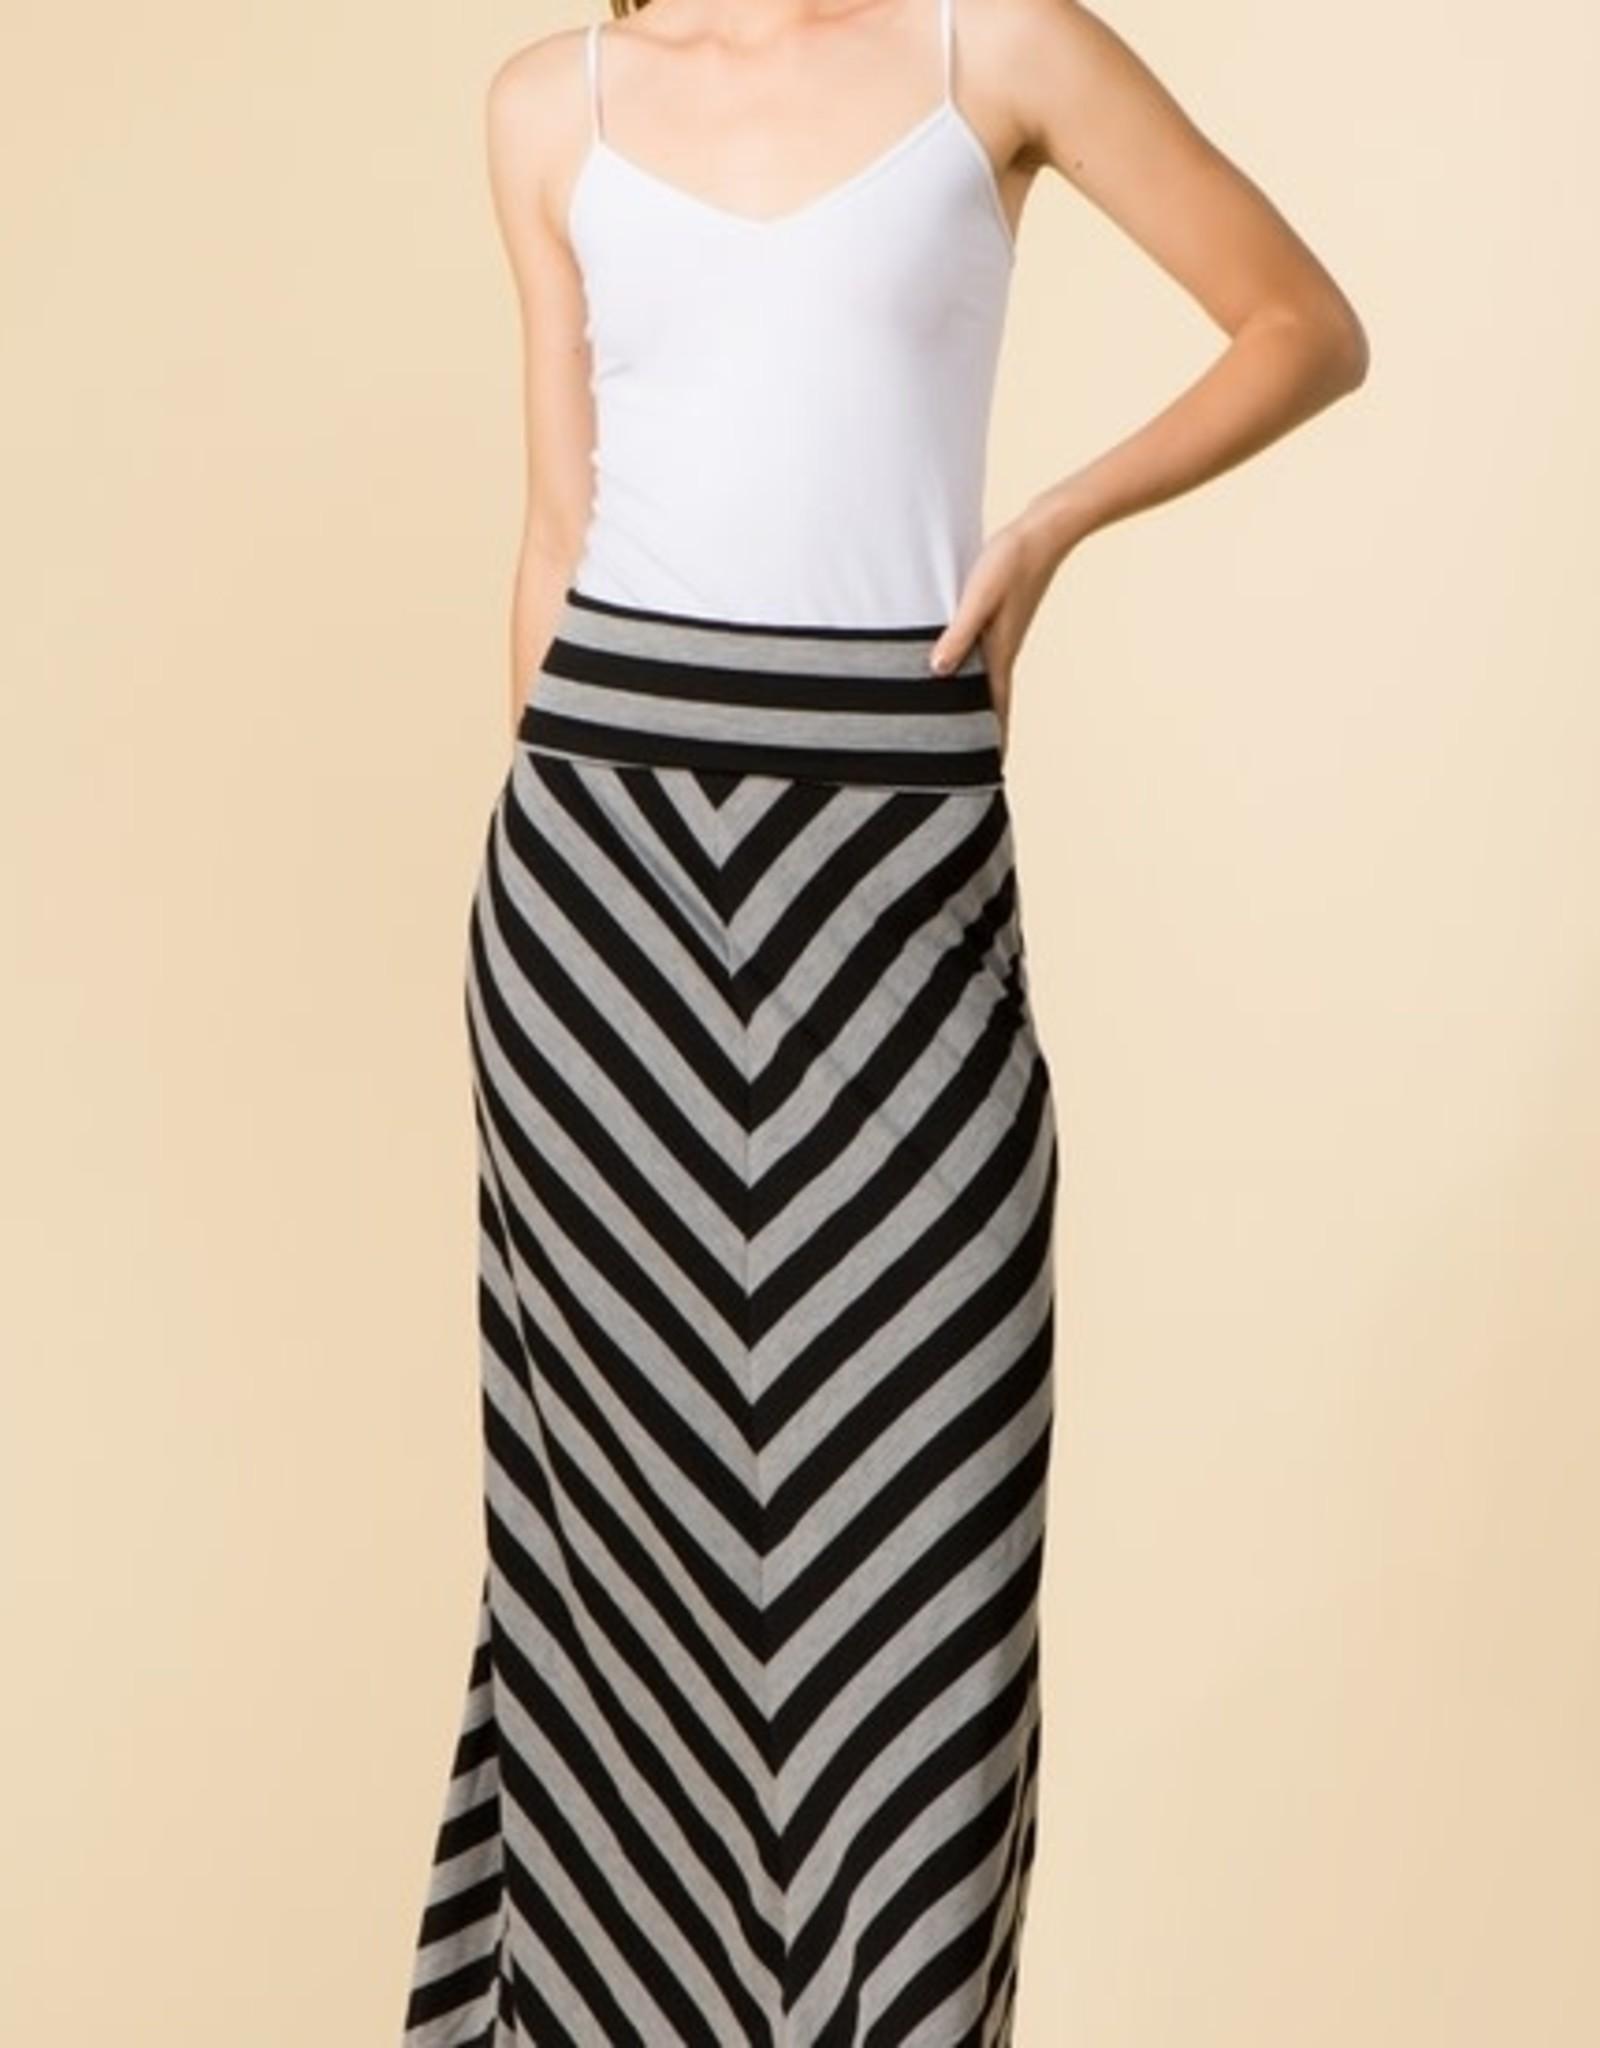 High Waist Chevron Maxi Skirt